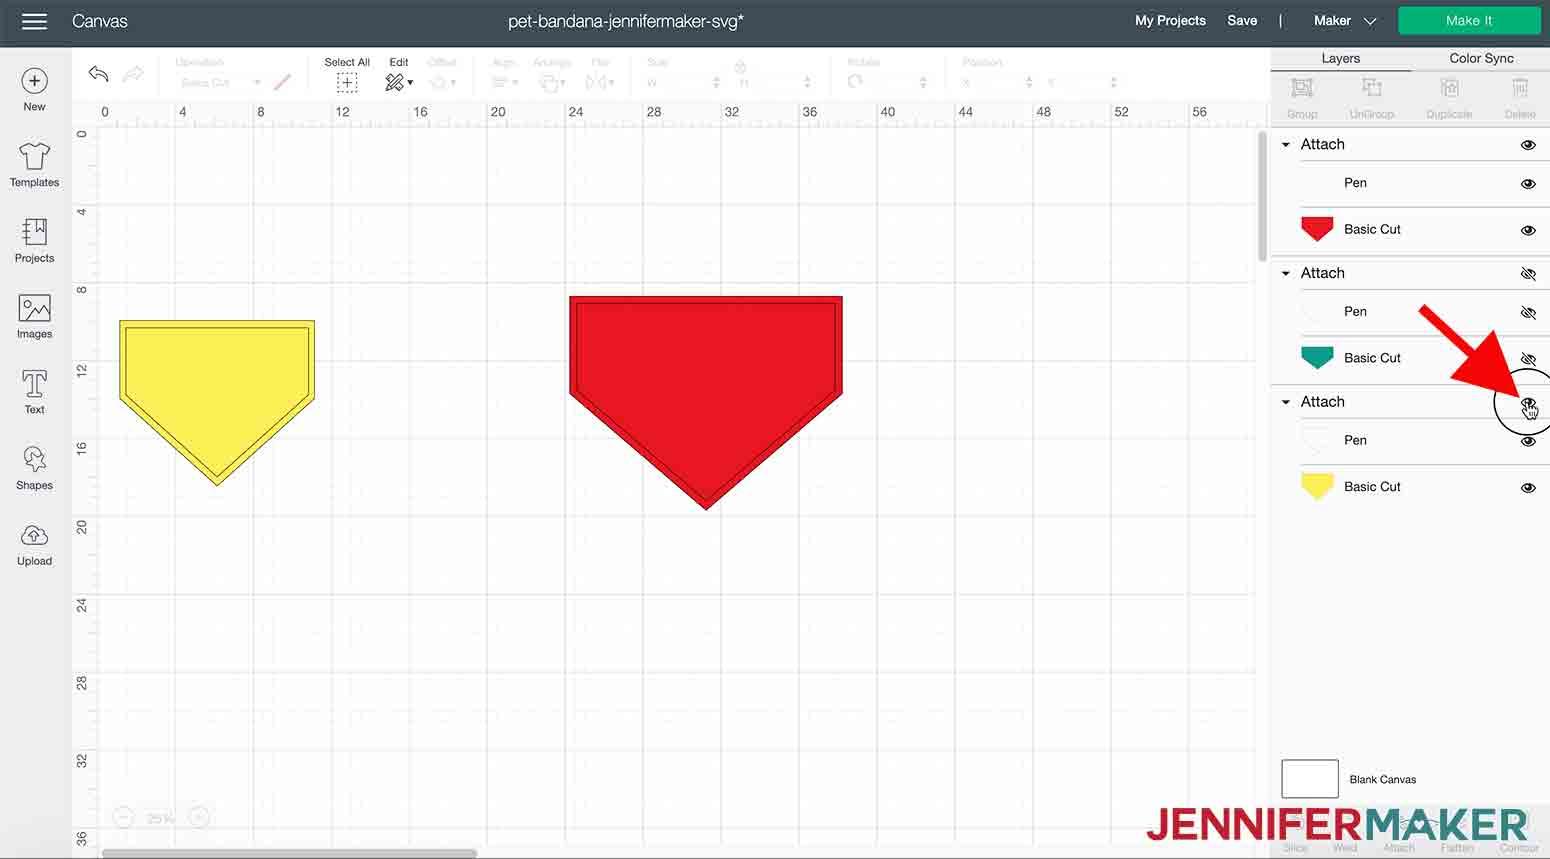 arrow pointing to eye icon to hide pet bandana jennifermaker